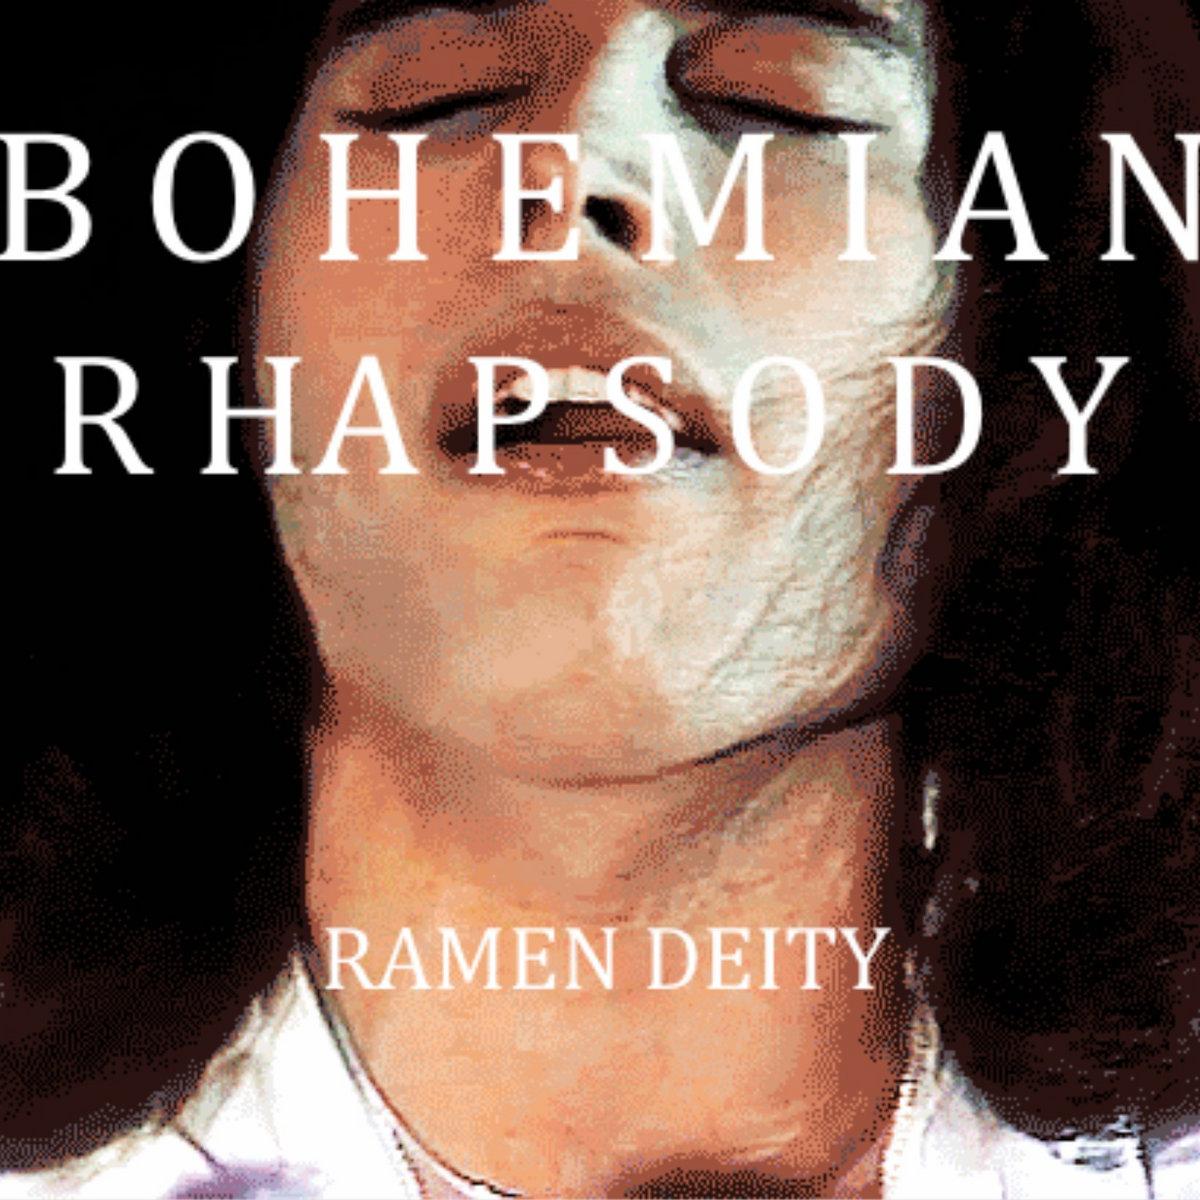 Bohemian Rhapsody Remix | Ramen Deity